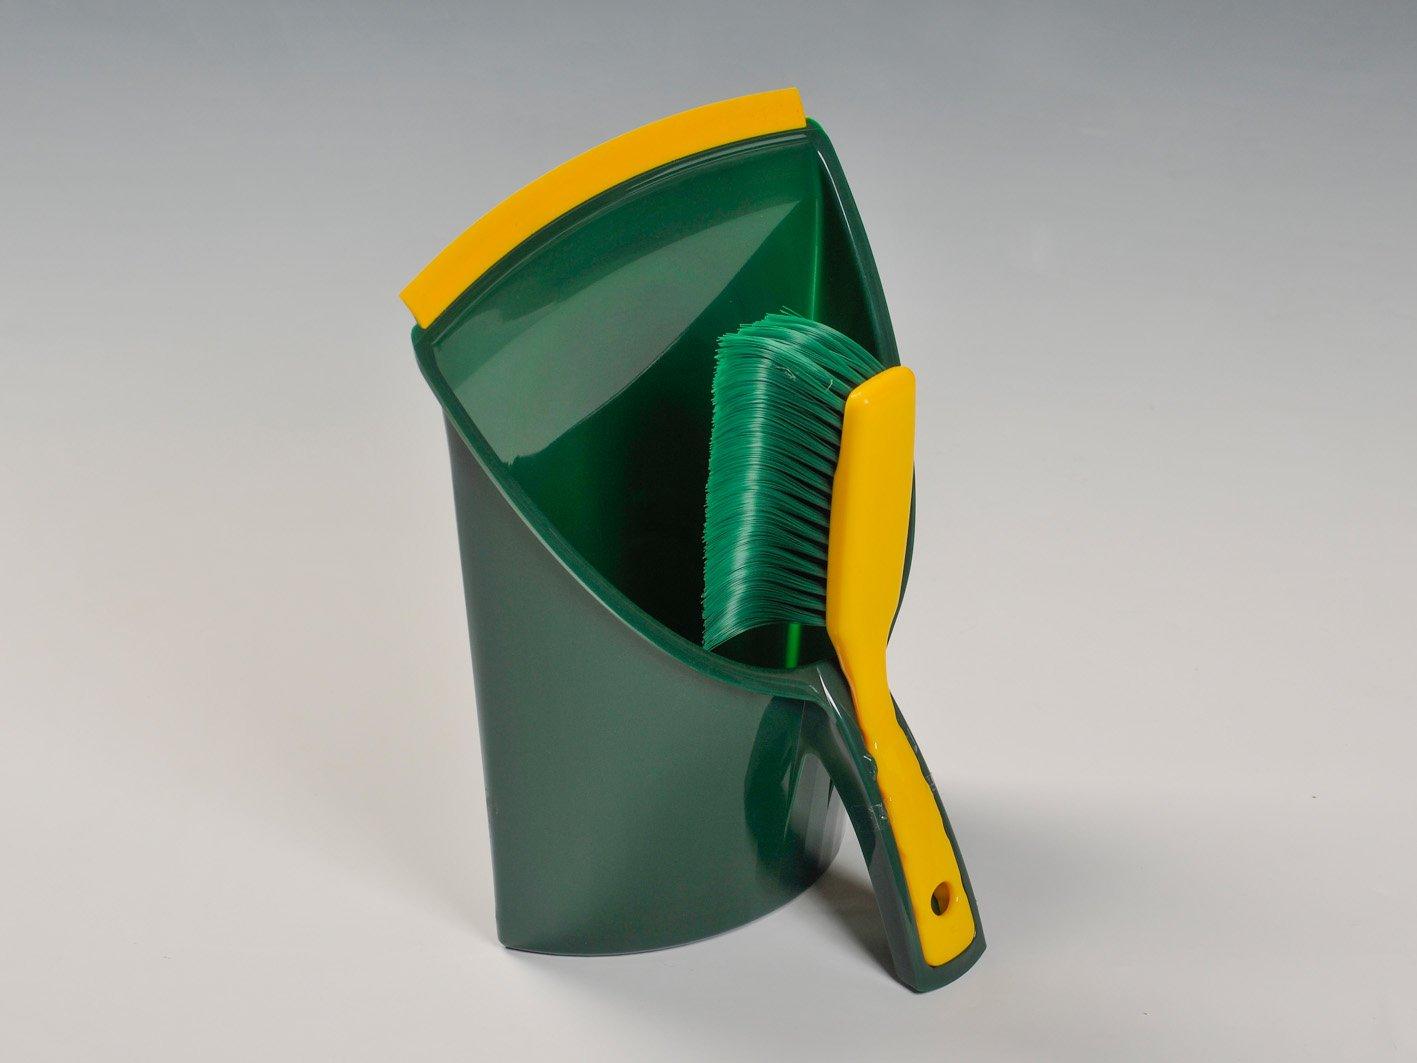 BÜMAG Broom Elaston krallenförm Jumbo Dustpan and Brush, Multi-Colour Bümag 327792